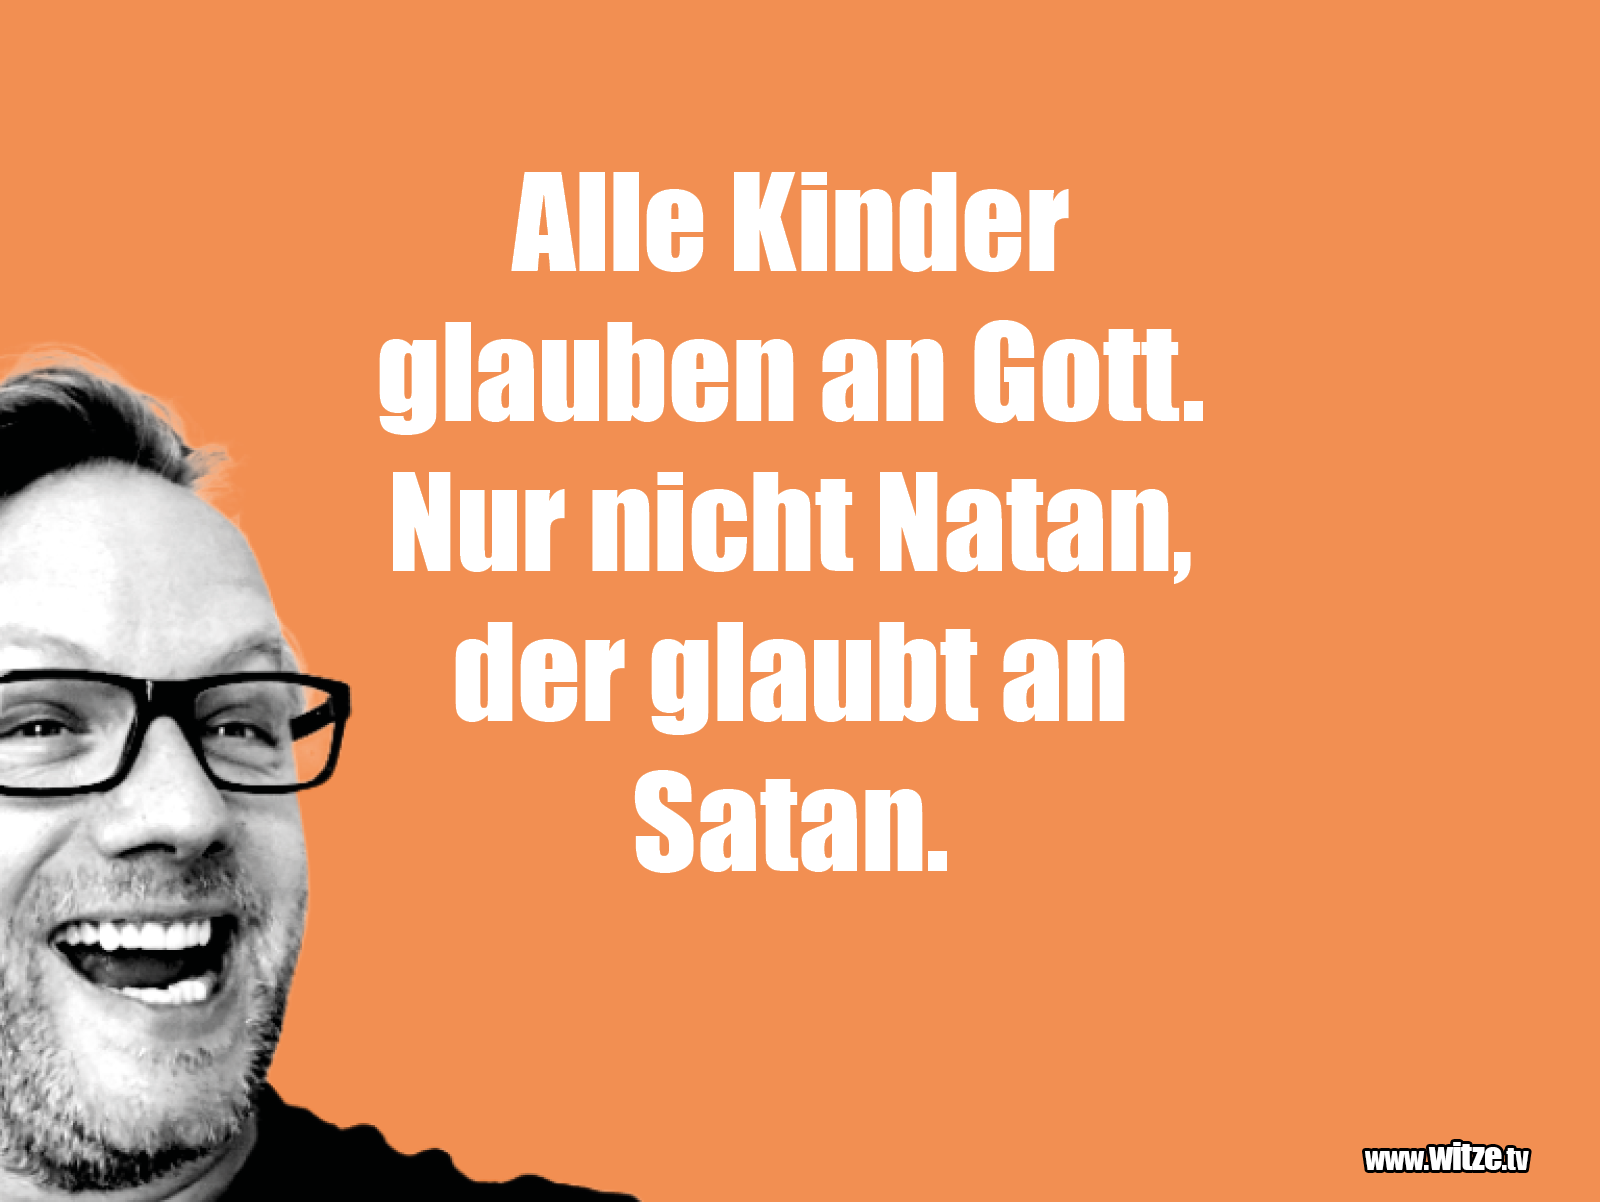 Hammer Gag... Alle Kinder glauben an Gott...